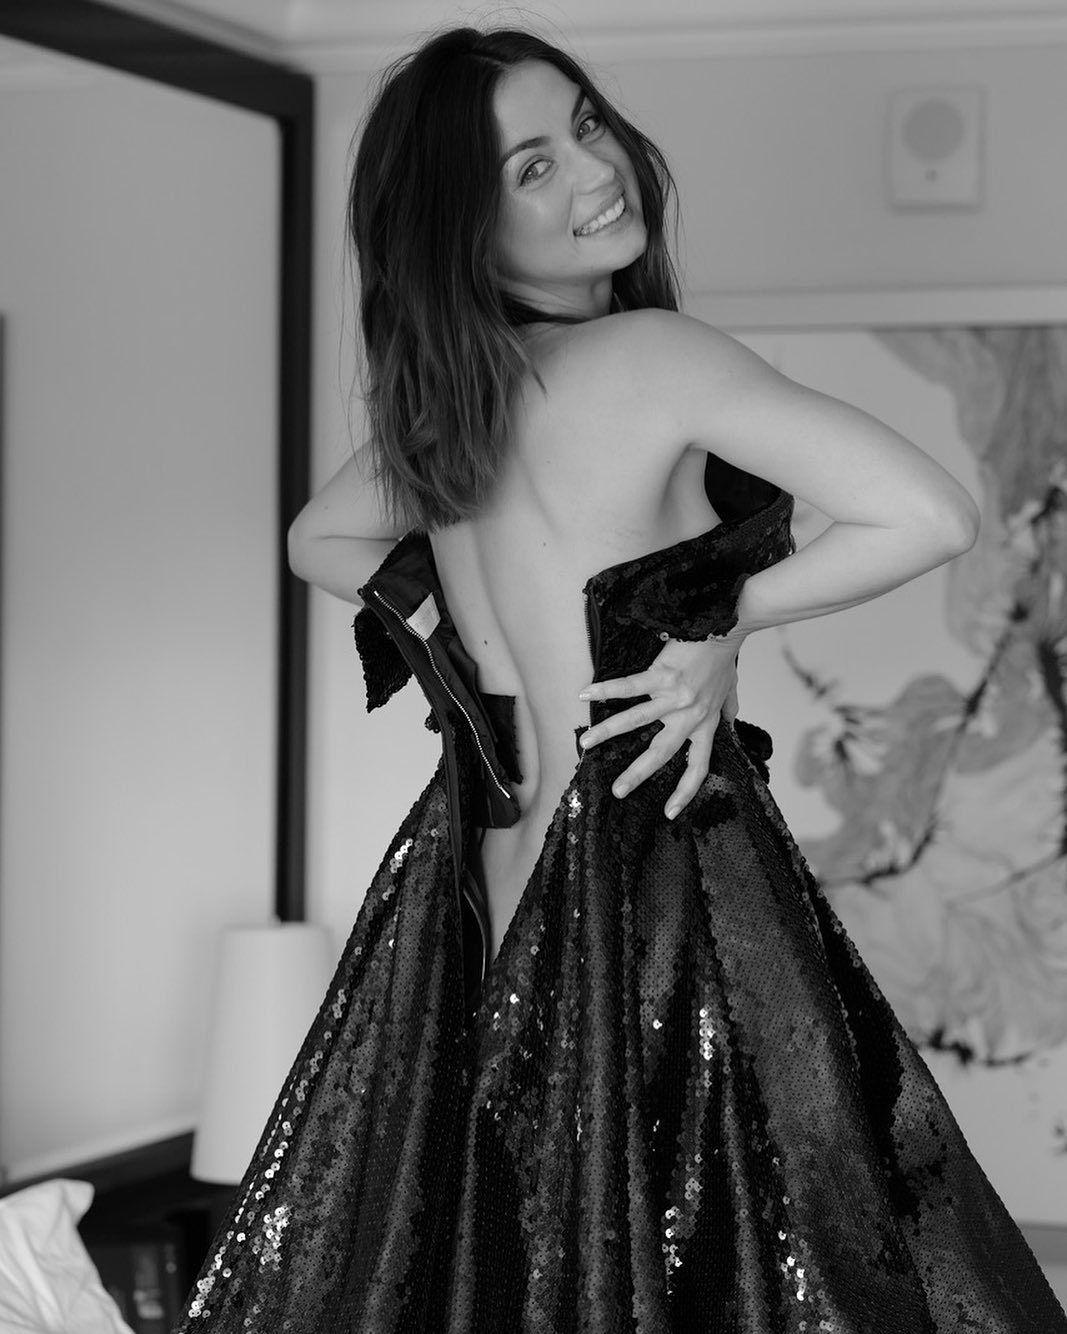 Ana De Armas Sexy Pic